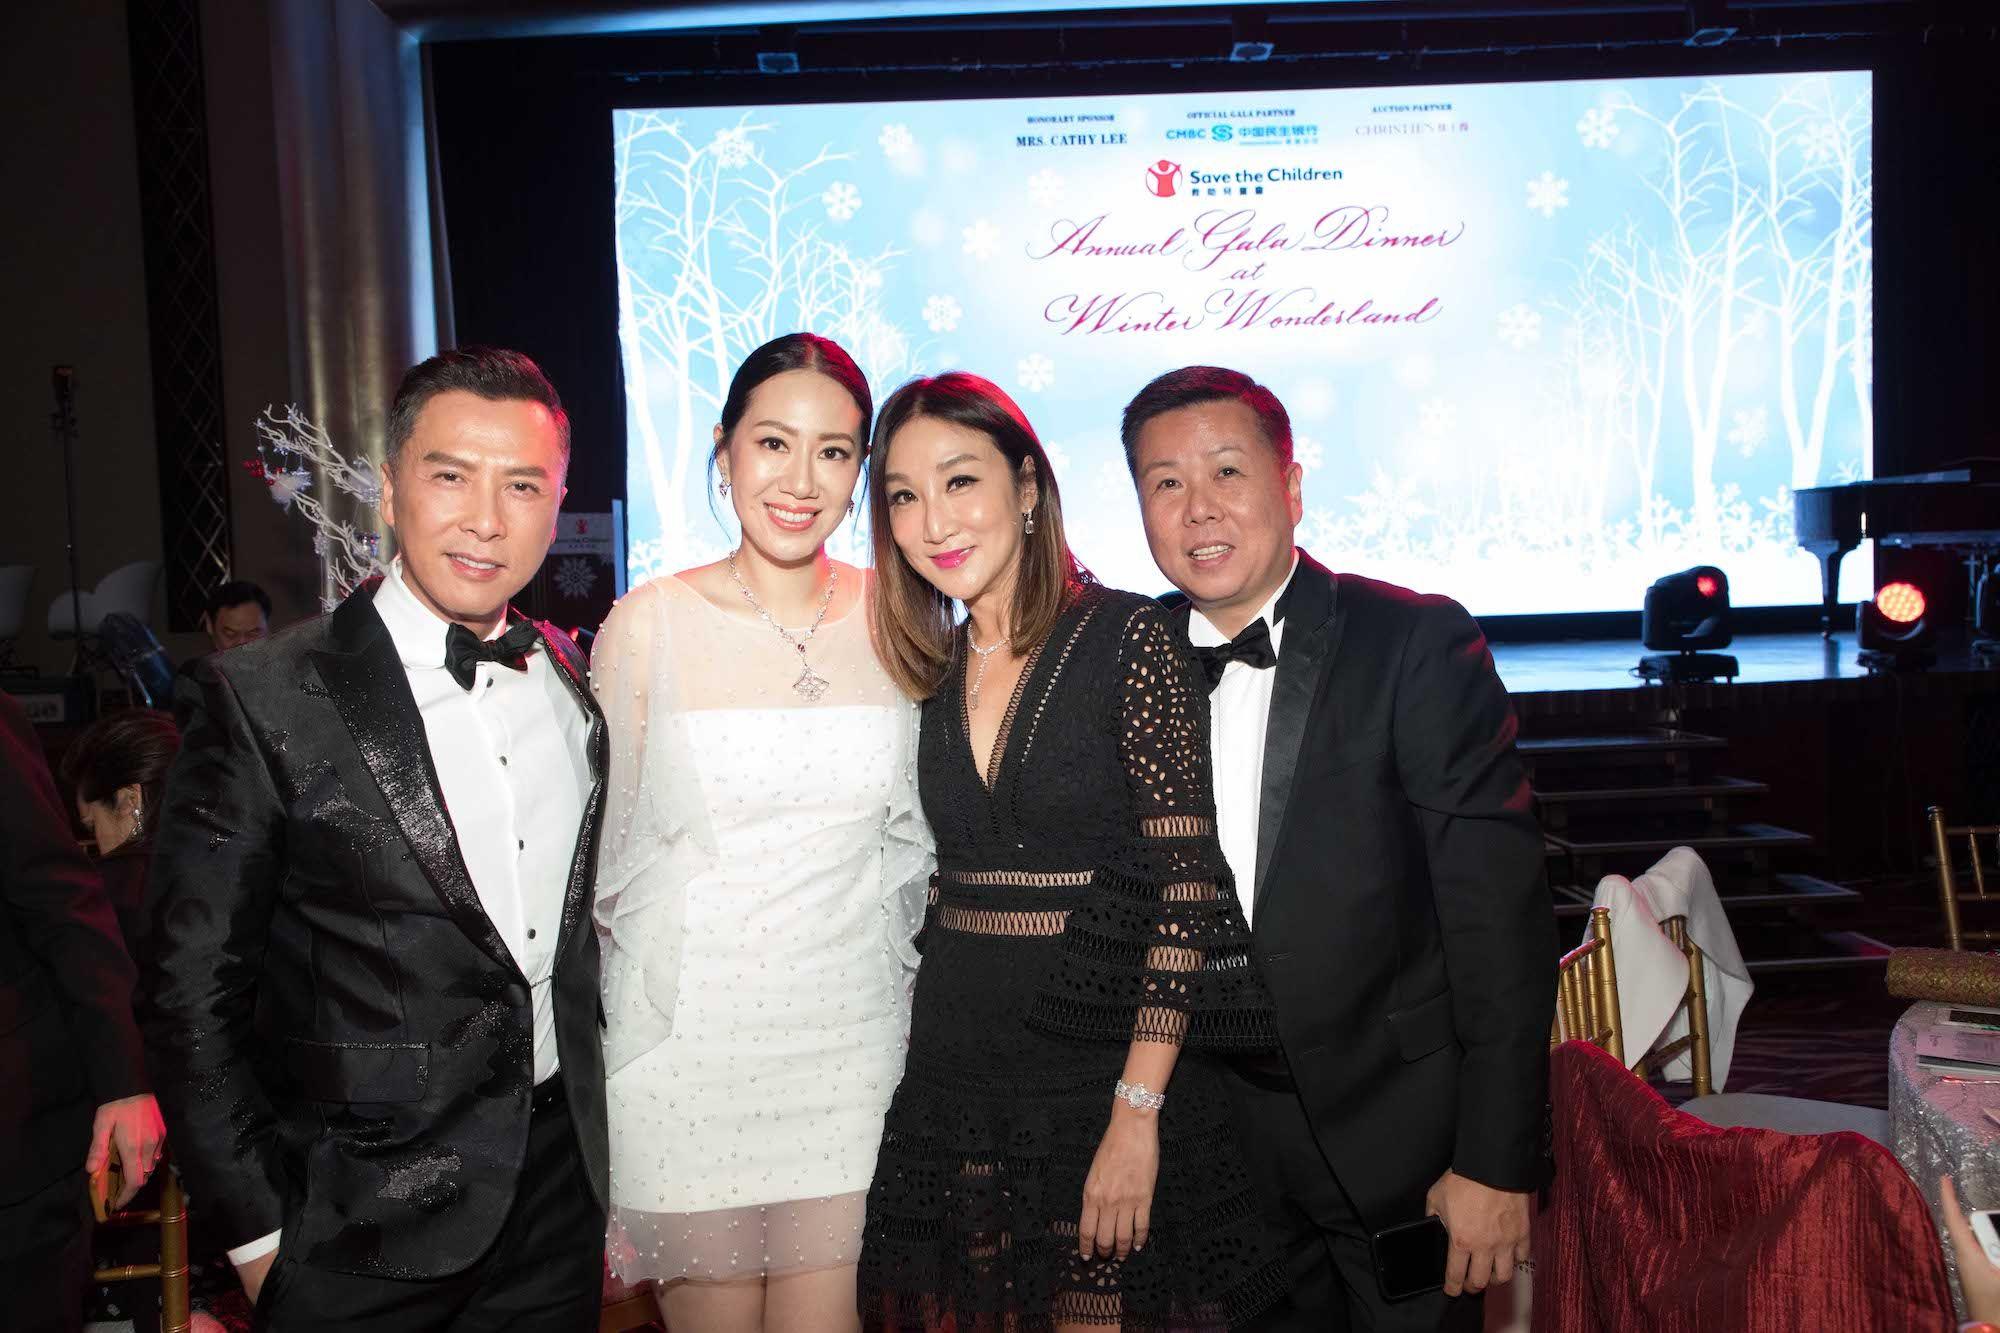 Donnie Yen, Cissy Wang, Jane Louey, James Louey